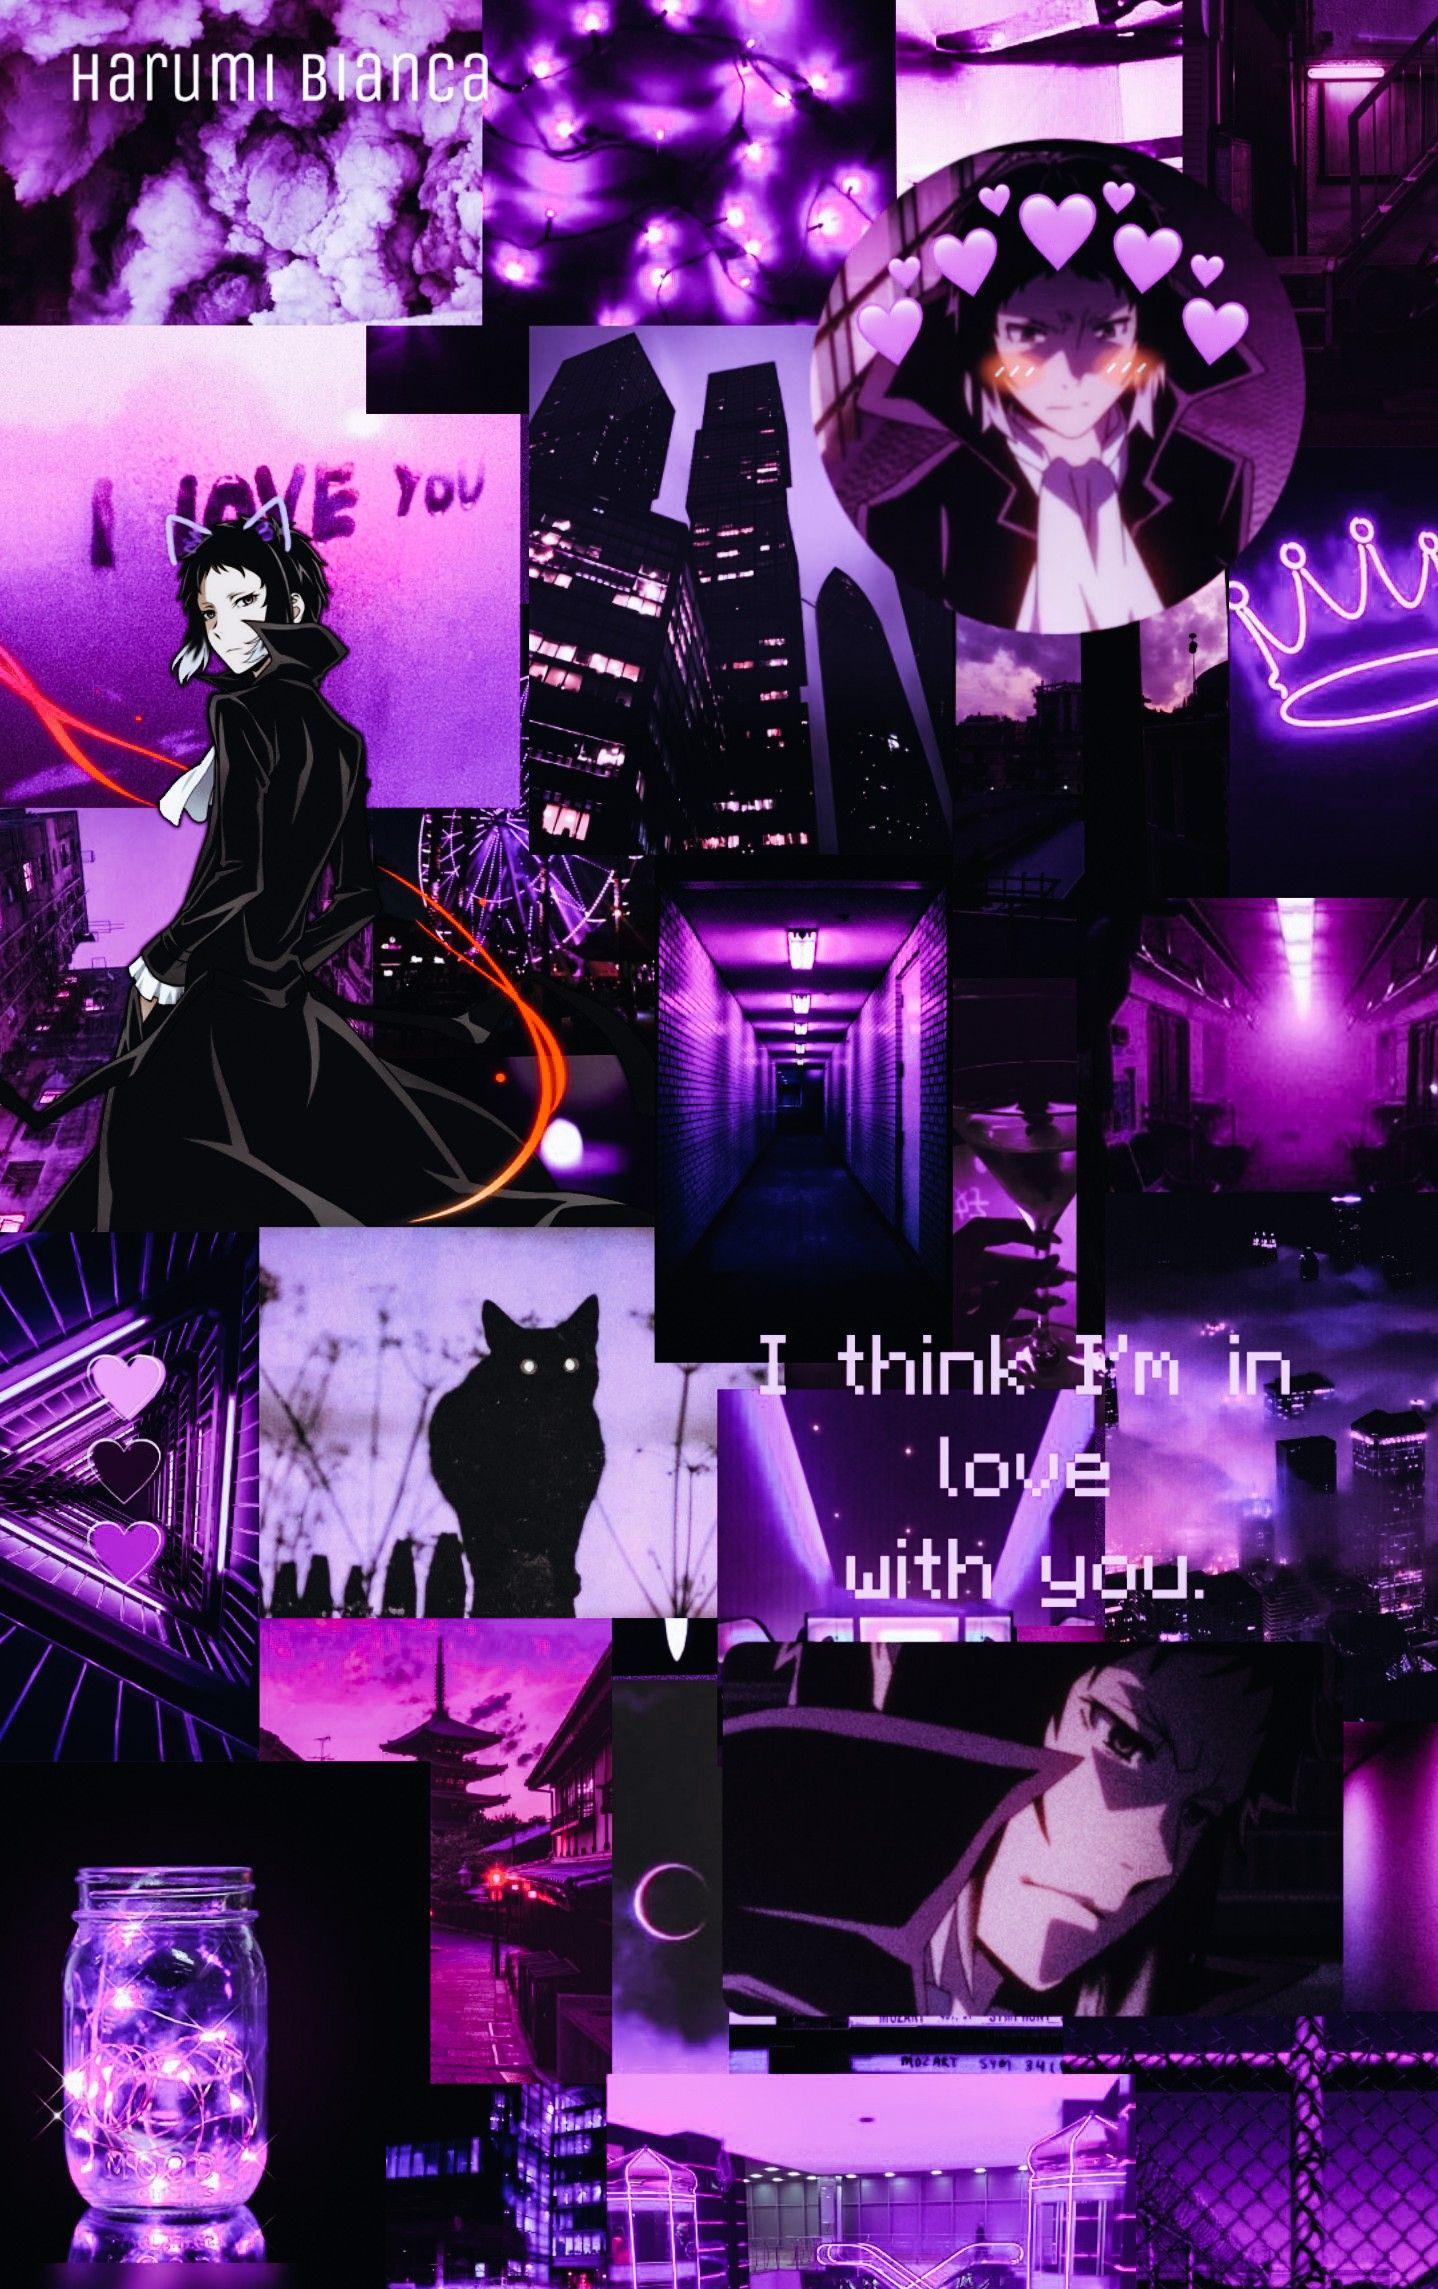 𝑱3𝒔𝒔𝒚𝑪𝒉𝒂𝒏 𝒃𝒚 𝑰𝒏𝒔𝒕𝒂𝒈𝒓𝒂𝒎 Anime Boy Anime Hero Wallpaper